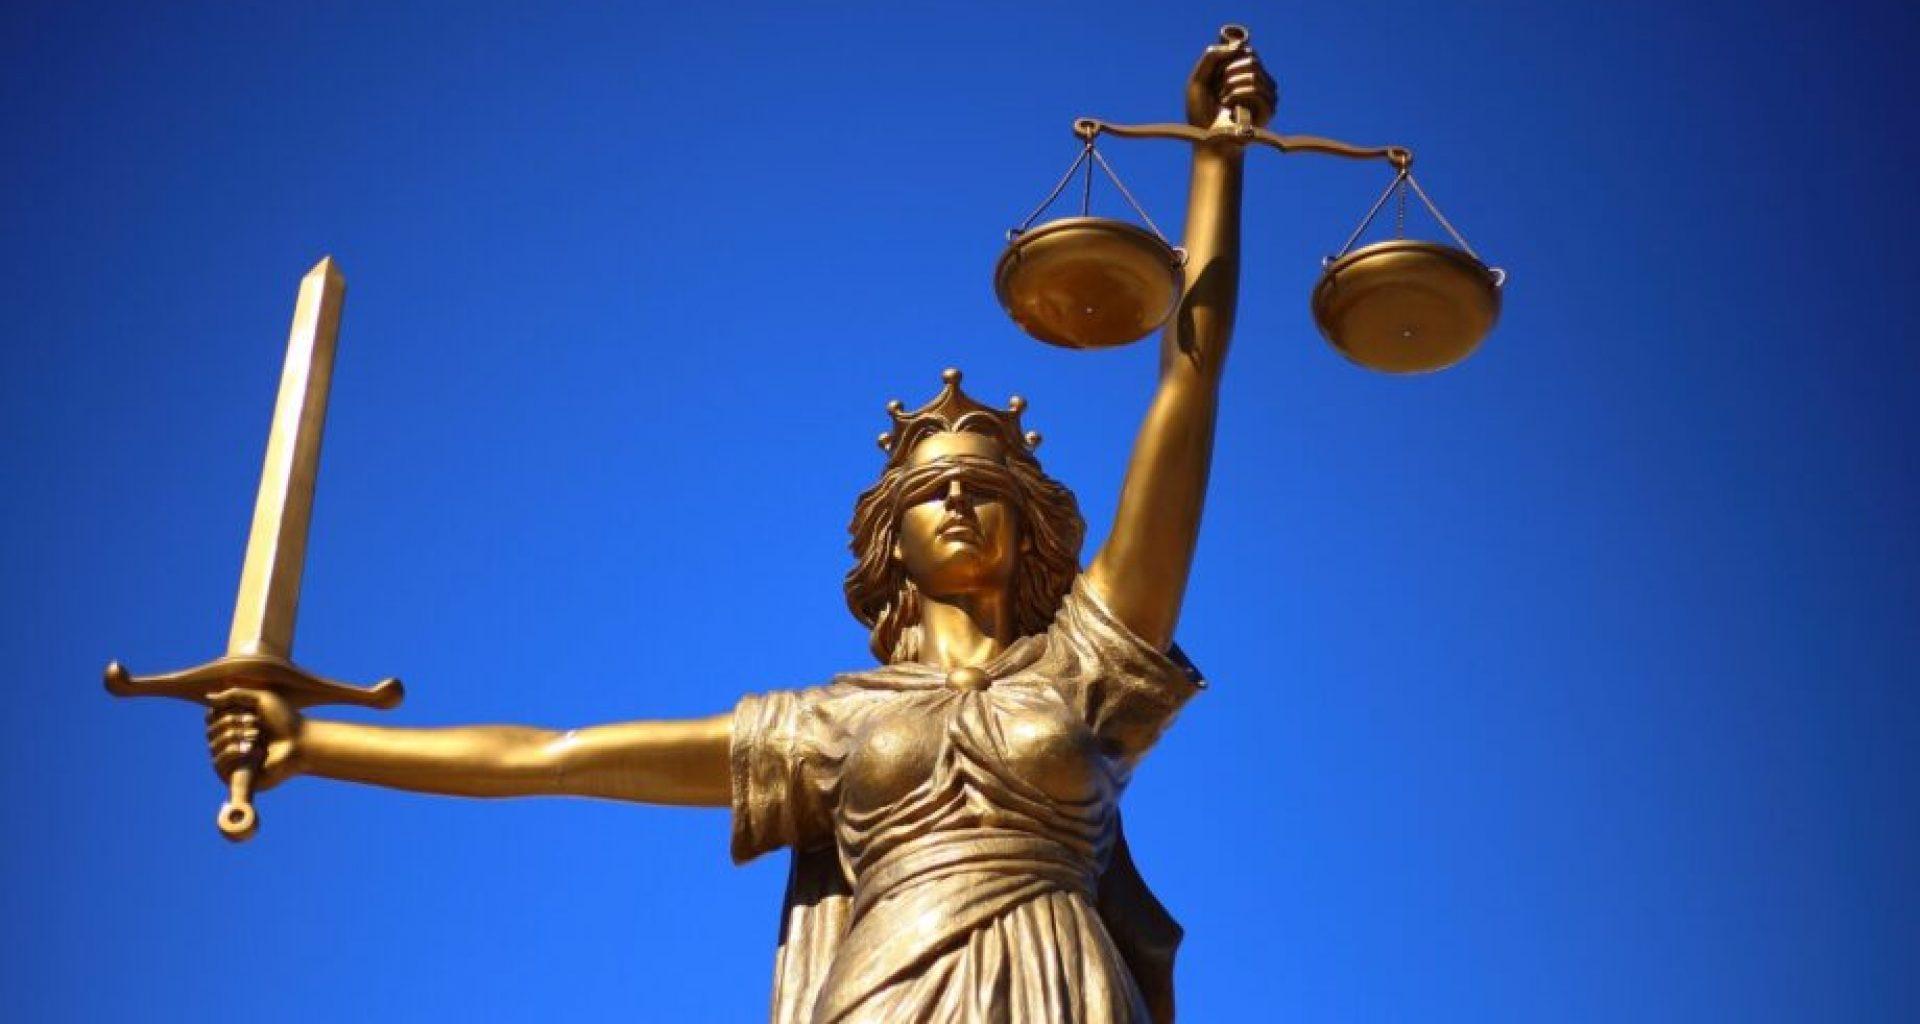 justice-2060093_1920 (1)